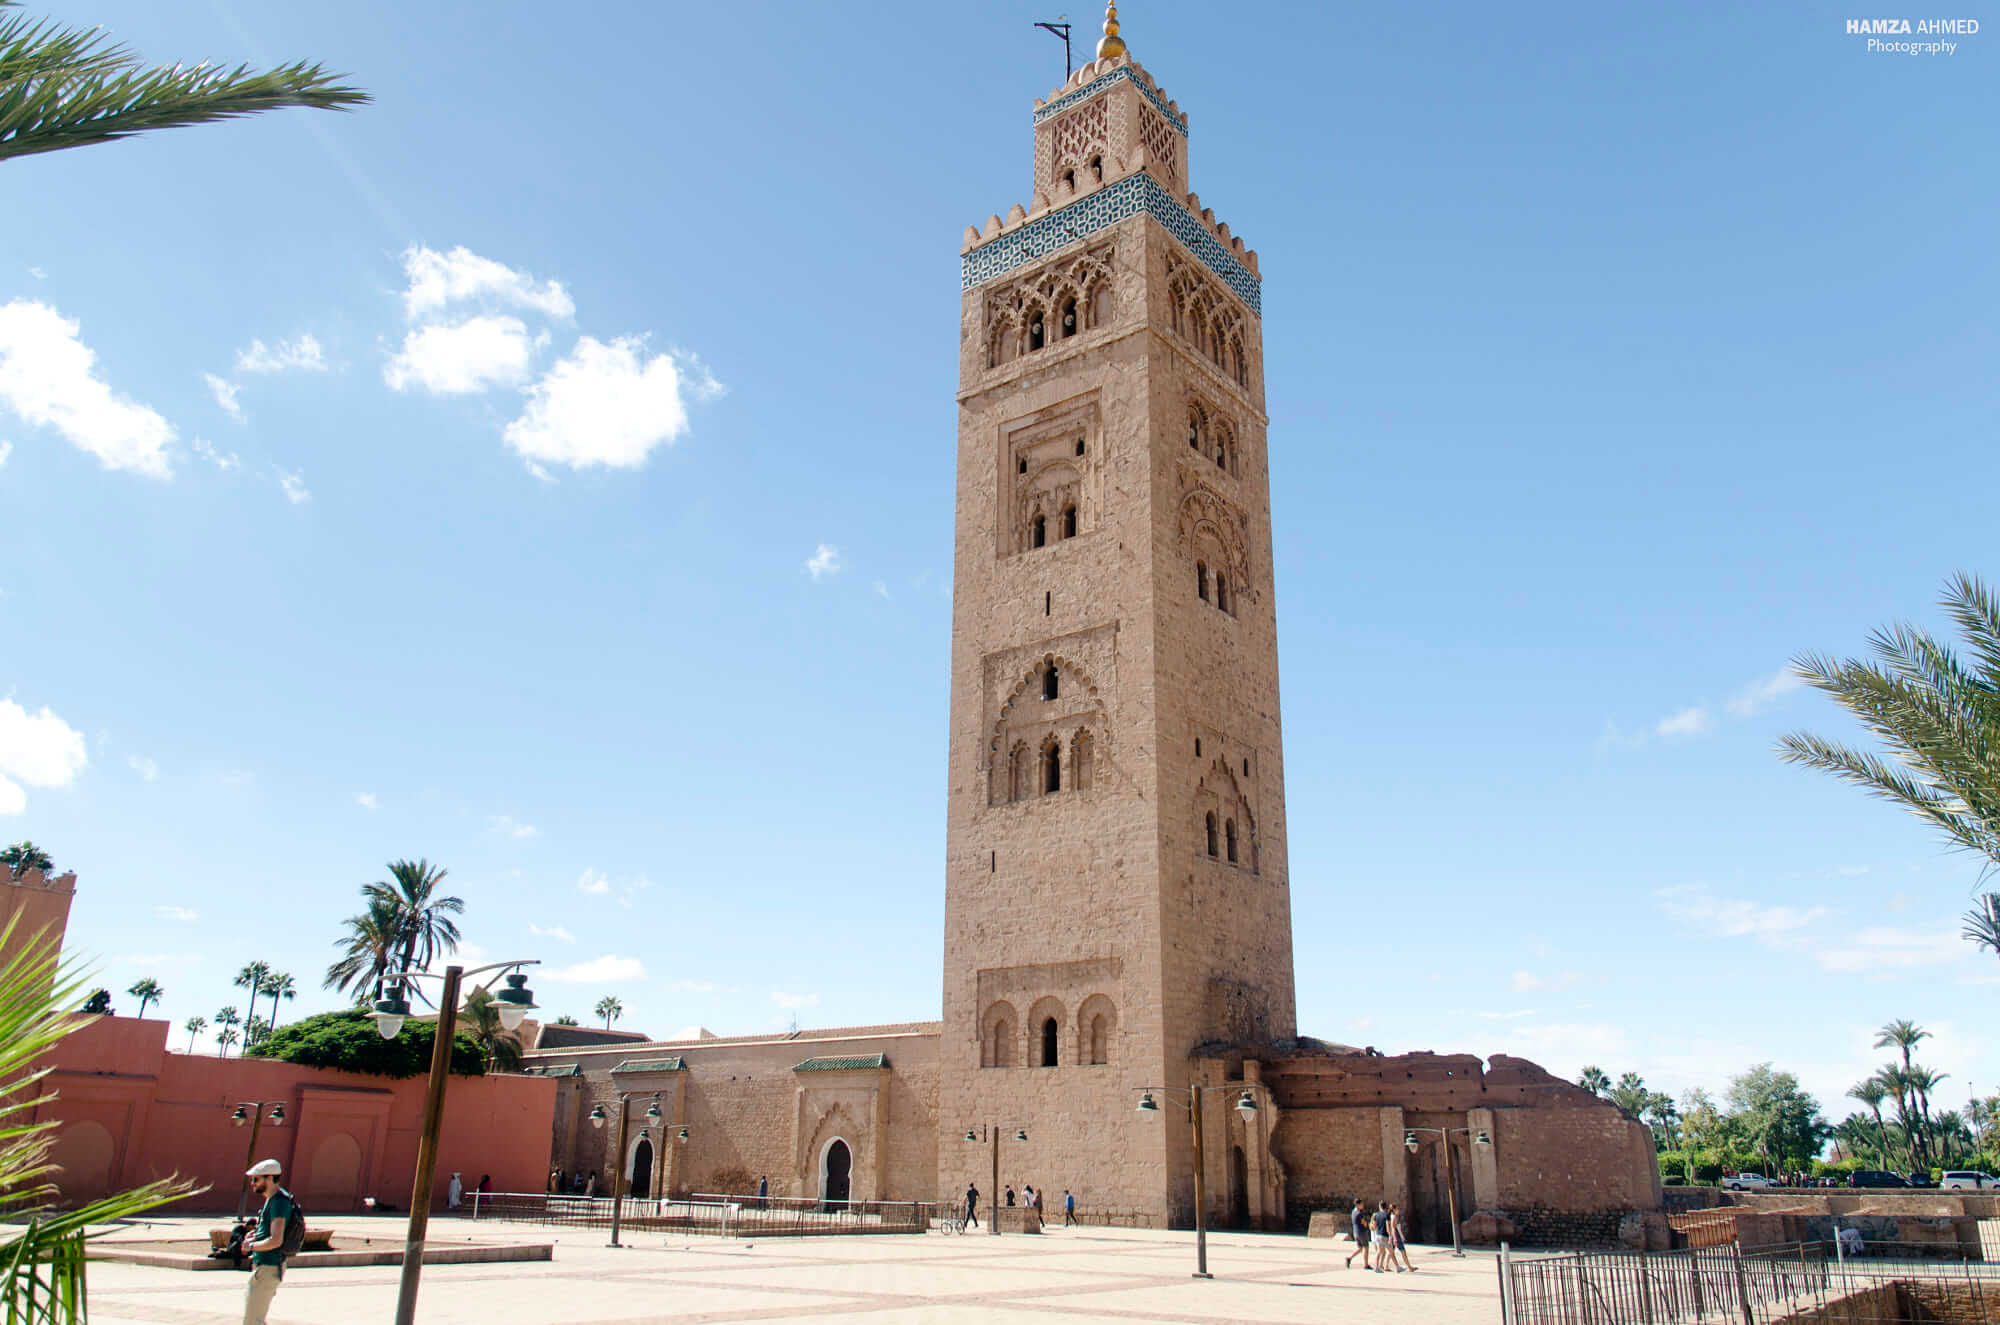 Koutoubia Mosque at Marrakech